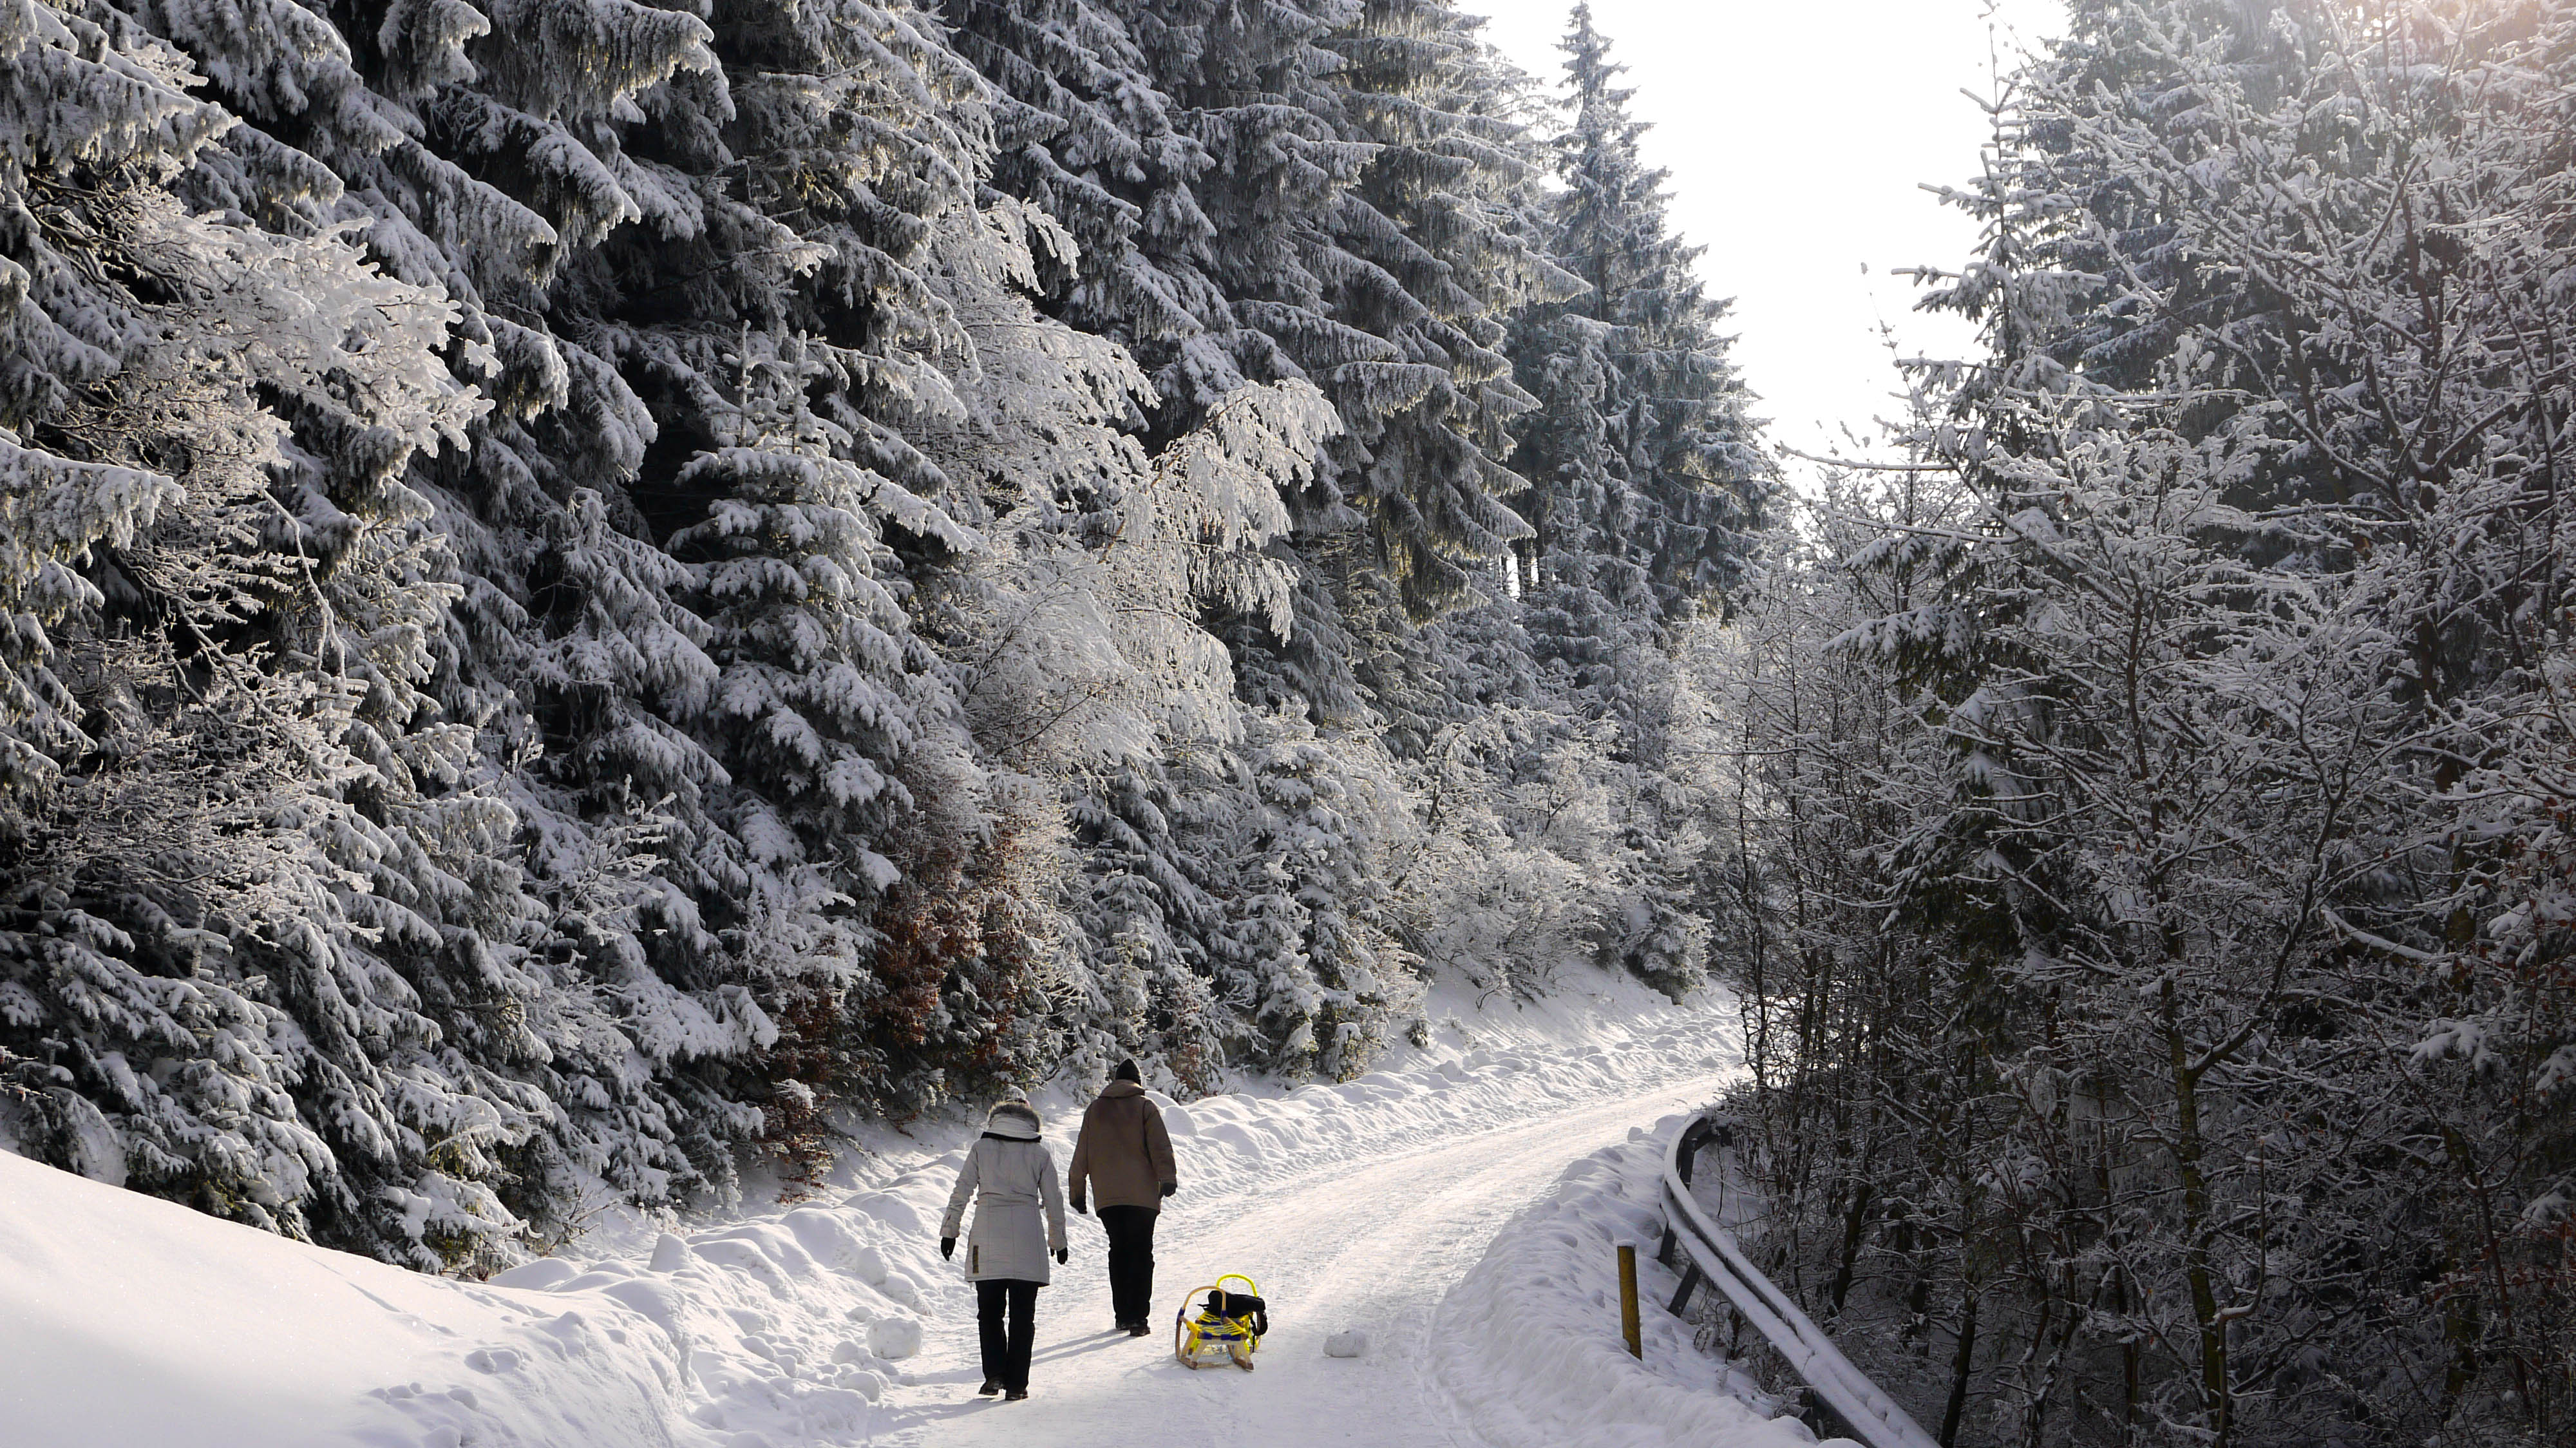 Hd Gif Wallpaper For Desktop File Winter Forest At Blomberg Germany Jpg Wikimedia